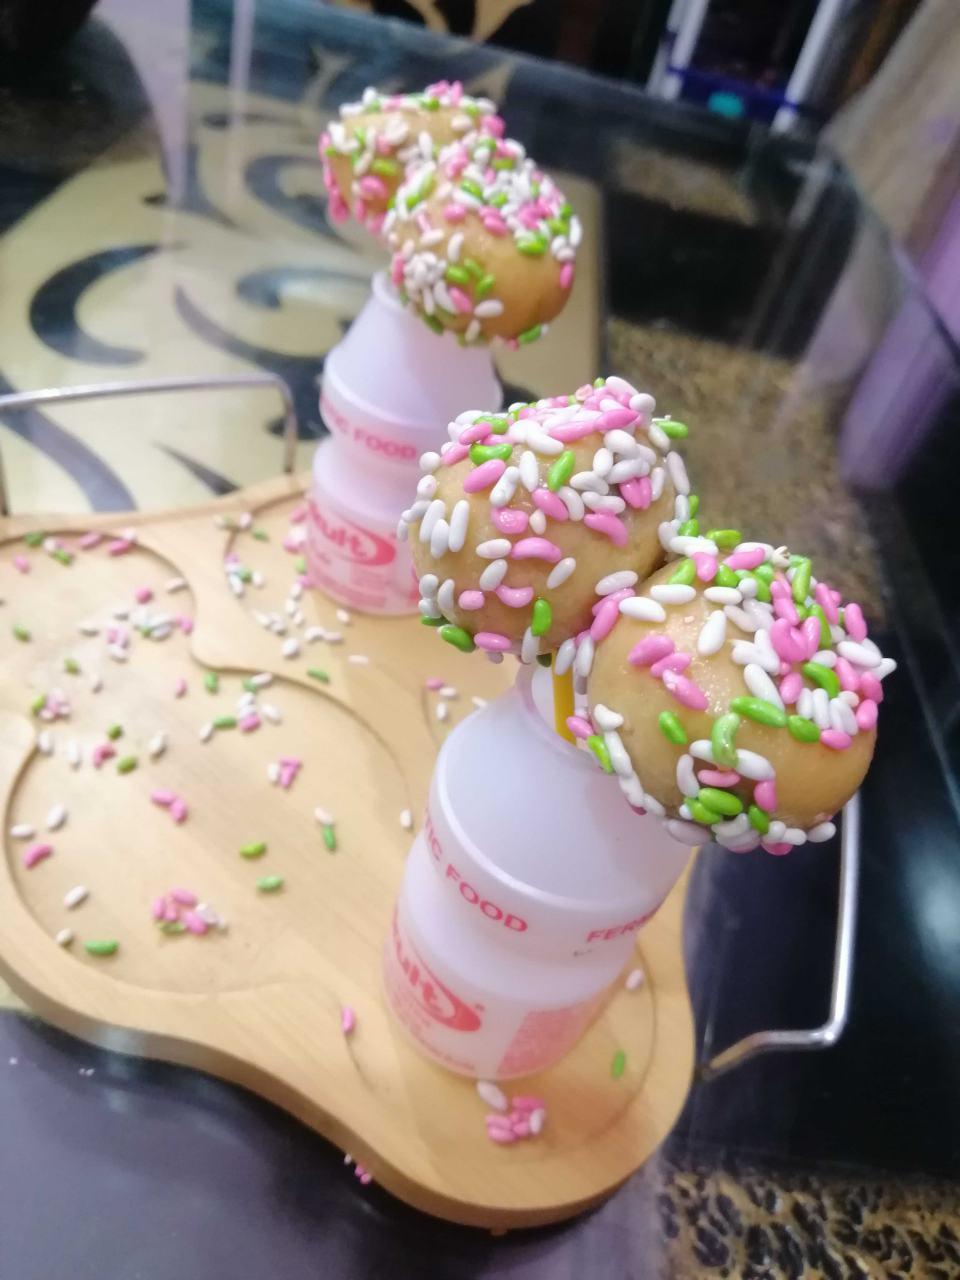 2 Ingredient Yakult Cake Pops